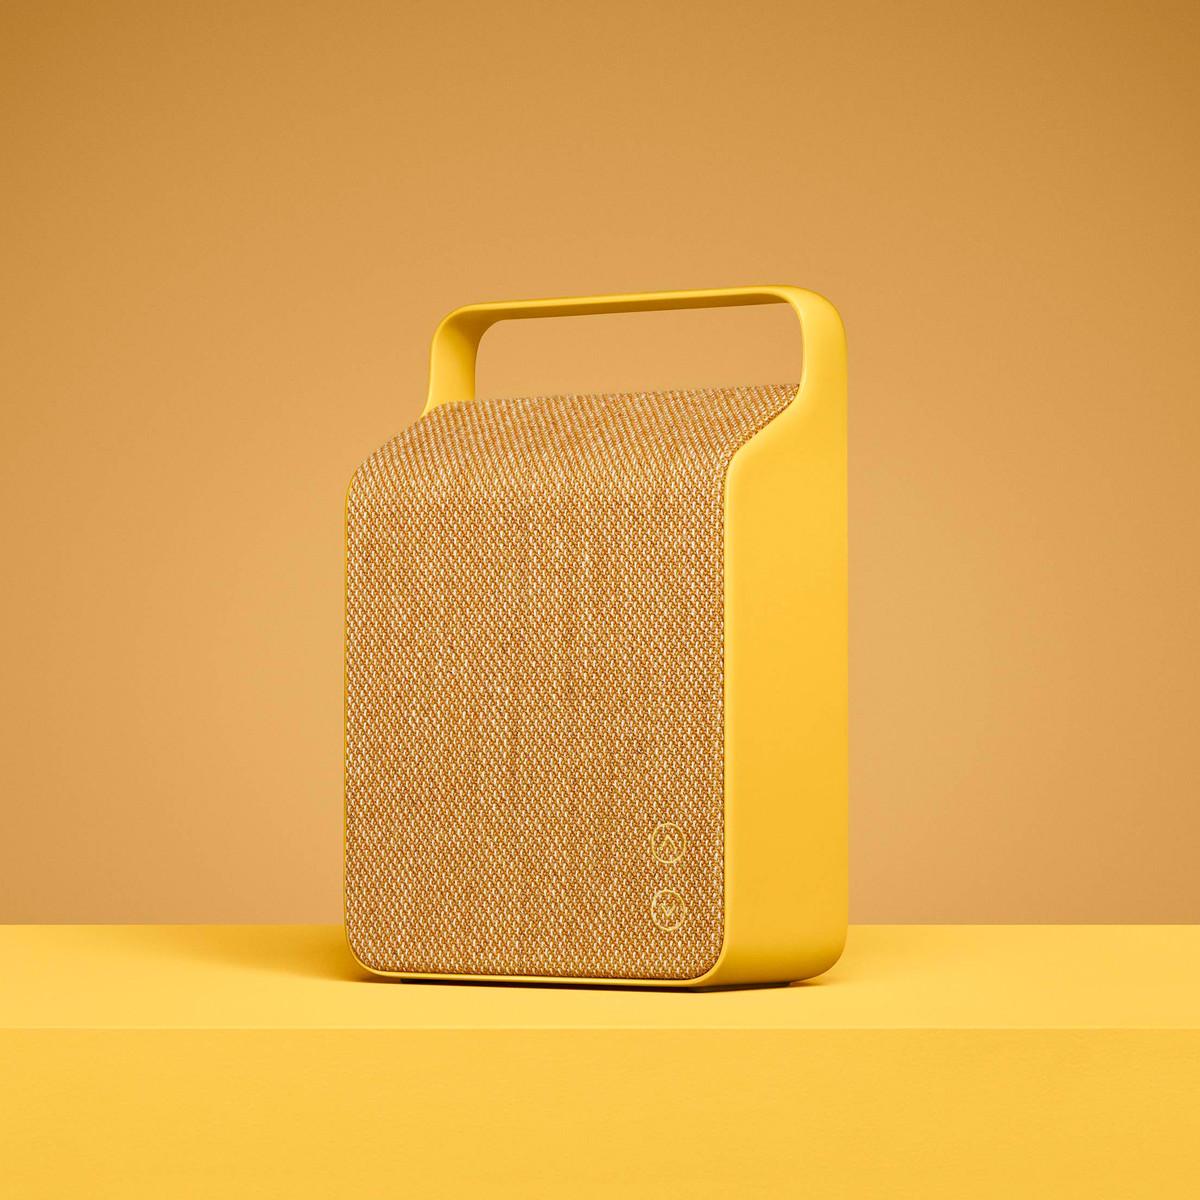 Vifa-Oslo-Lautsprecher-sand-yellow-Freisteller-gedreht